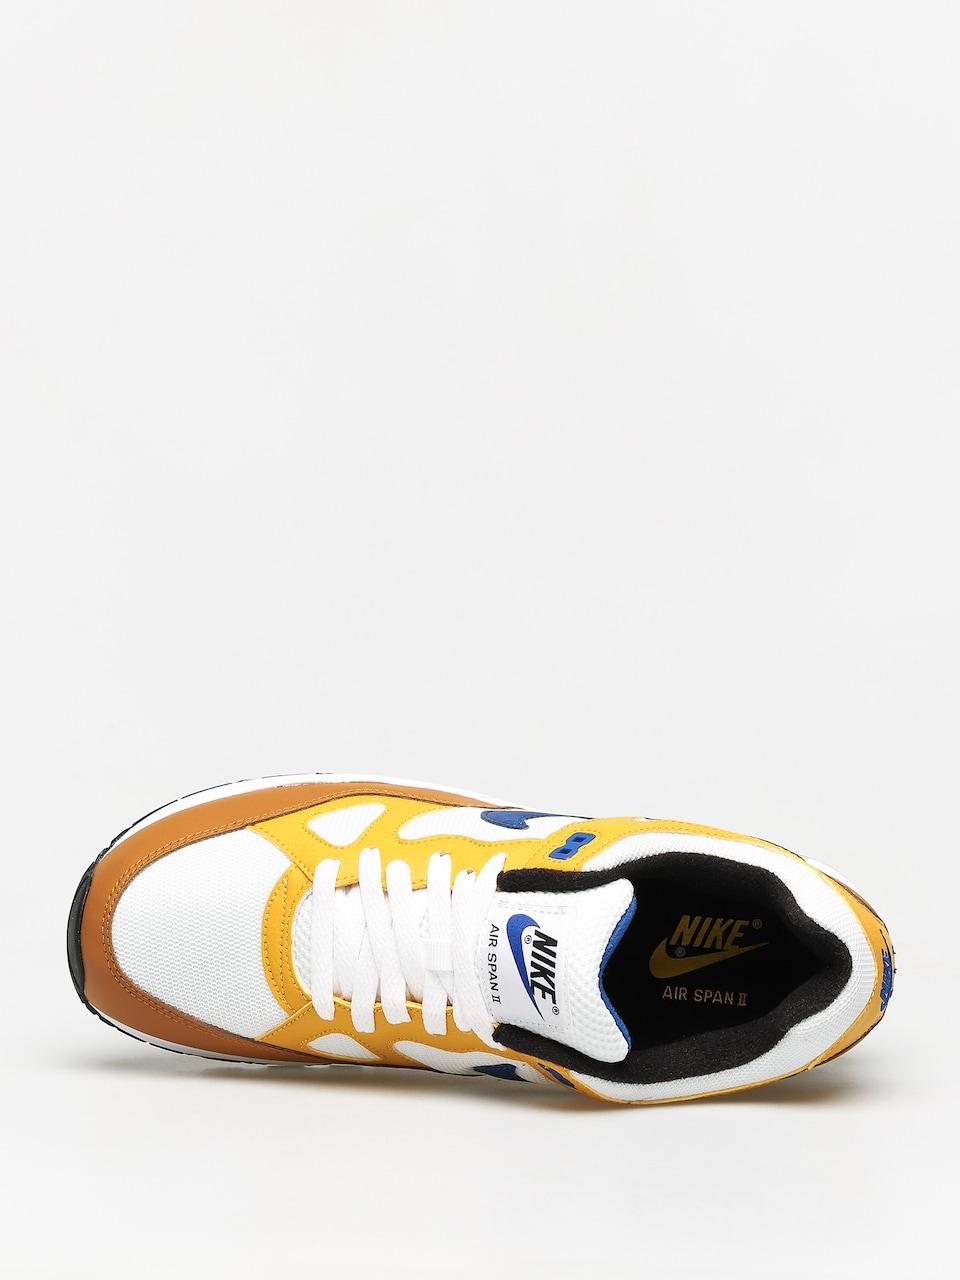 Buty Nike Air Span II (yellow ochreindigo force desert ochre)